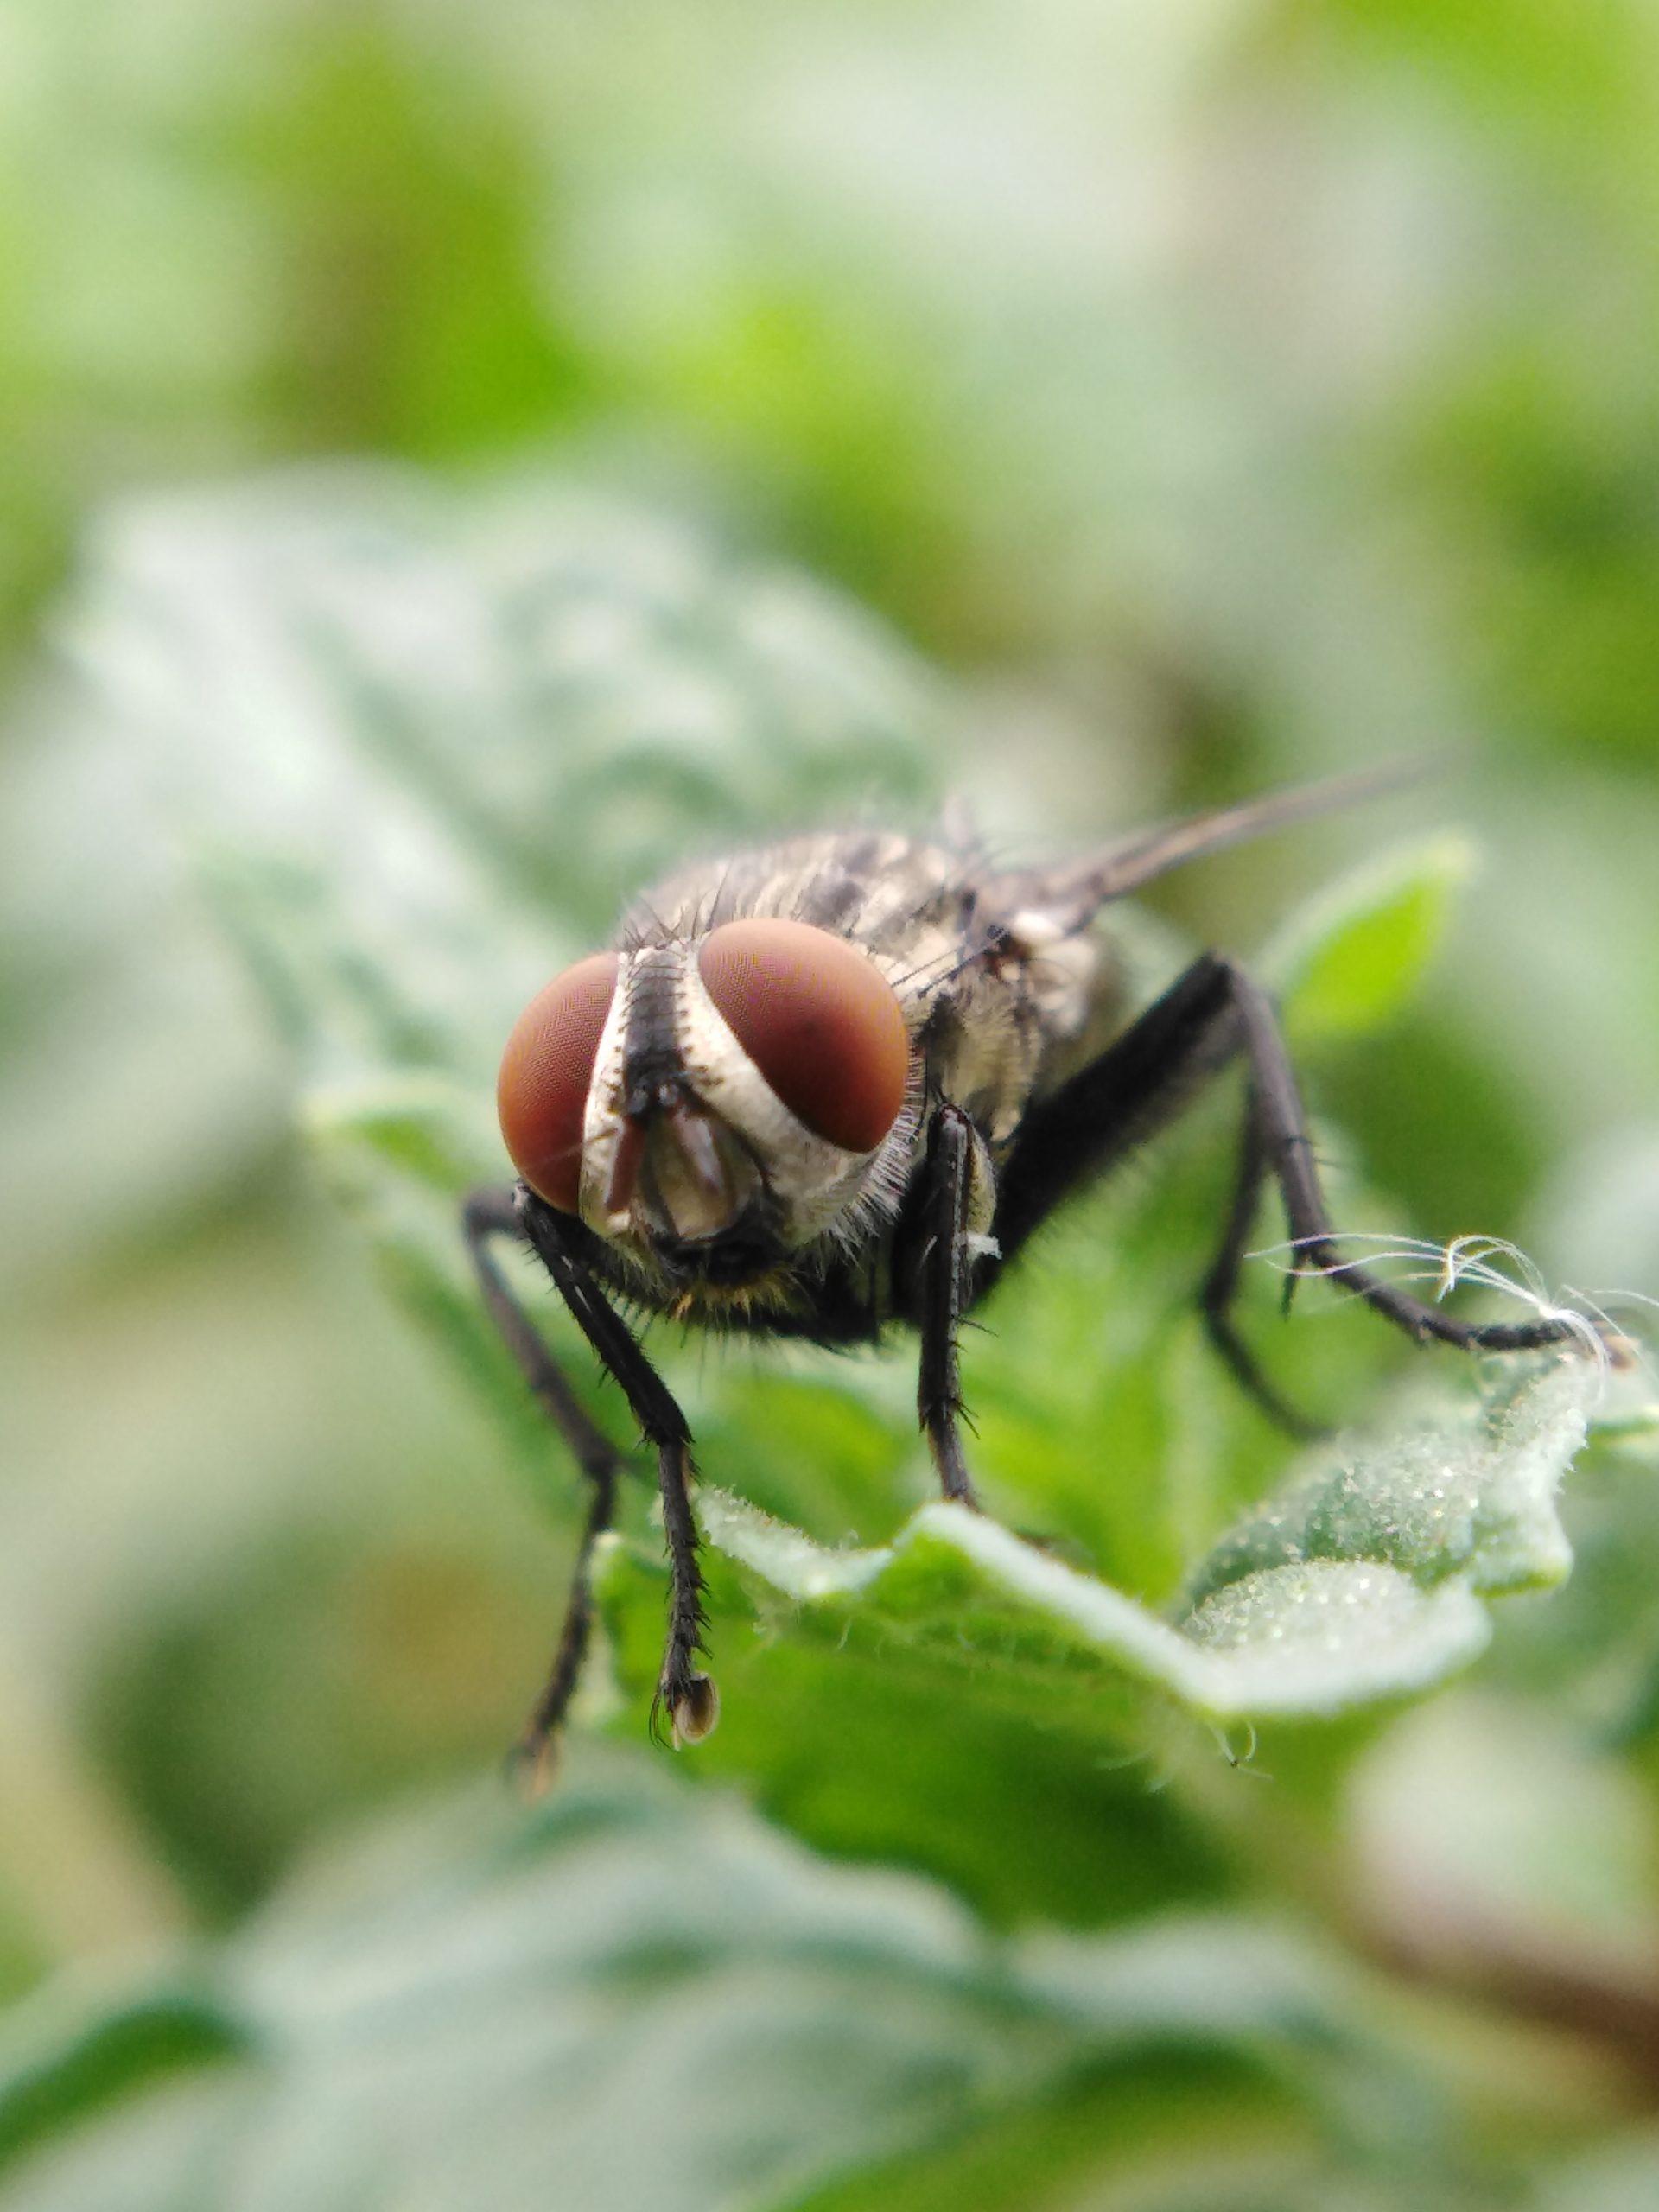 Closeup of a housefly